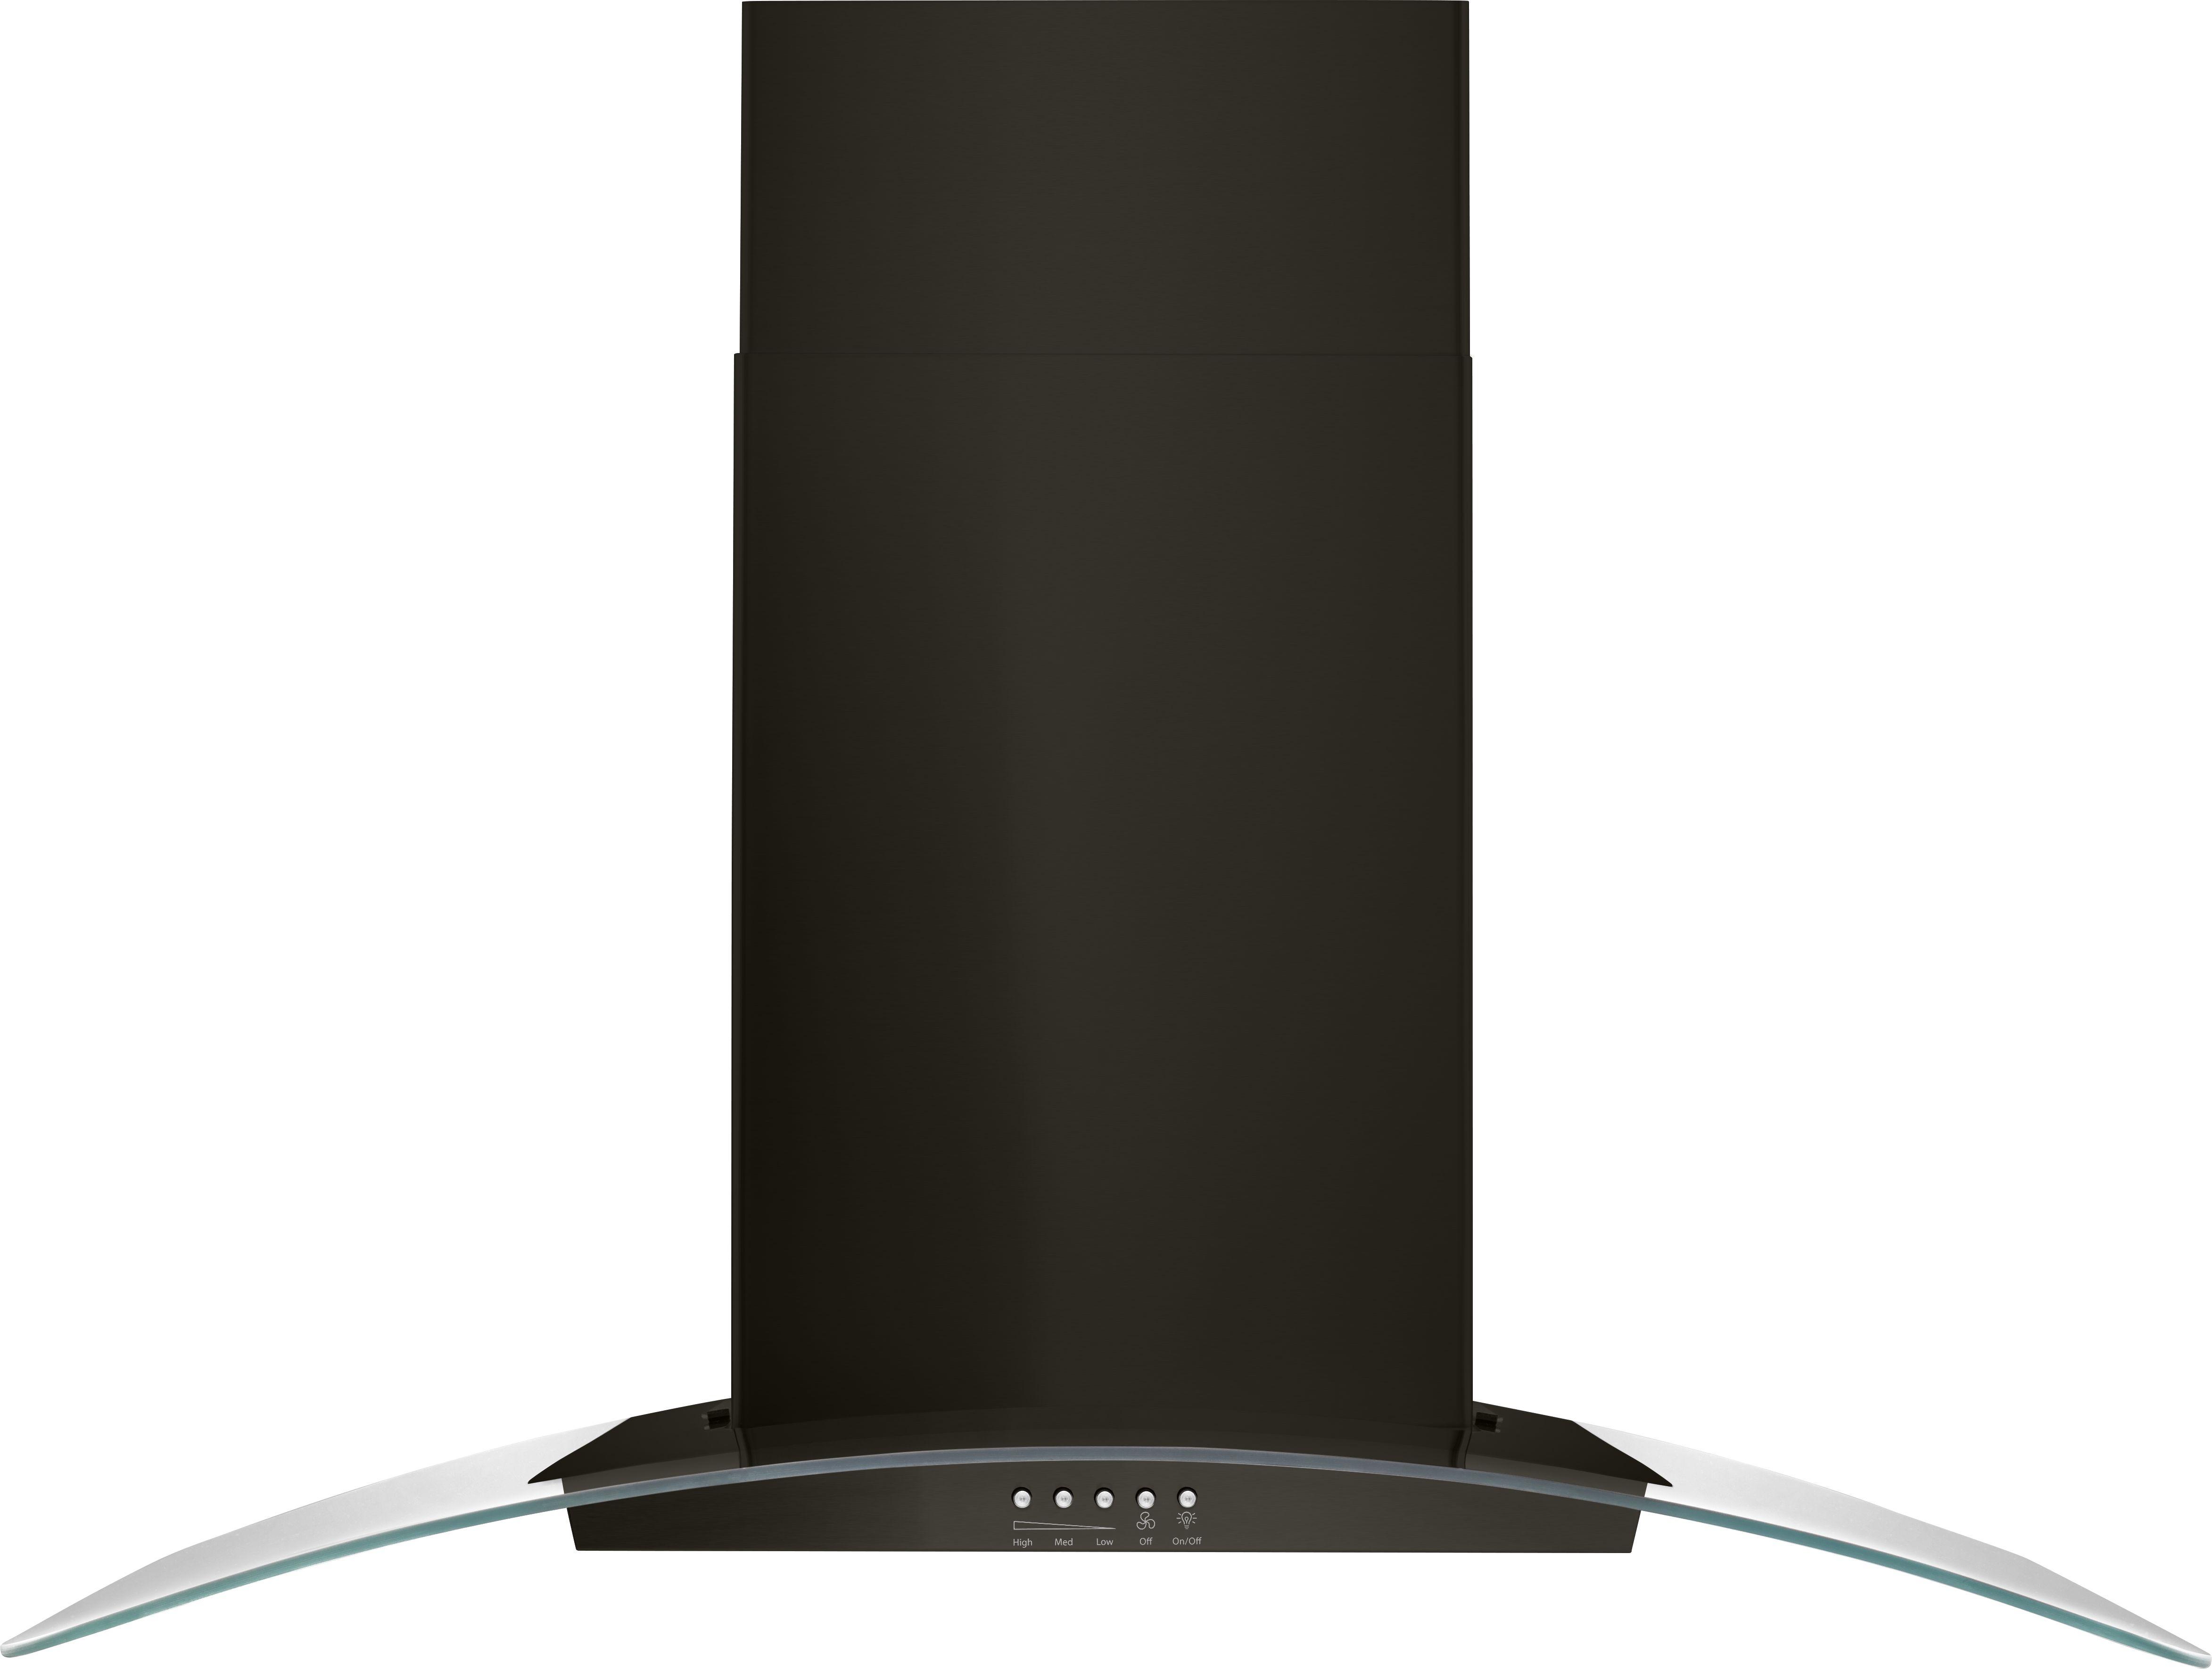 Kitchenaid 36 Concave Glass Wall Mount Range Hood Black Stainless Wvw51uc6hv Ka